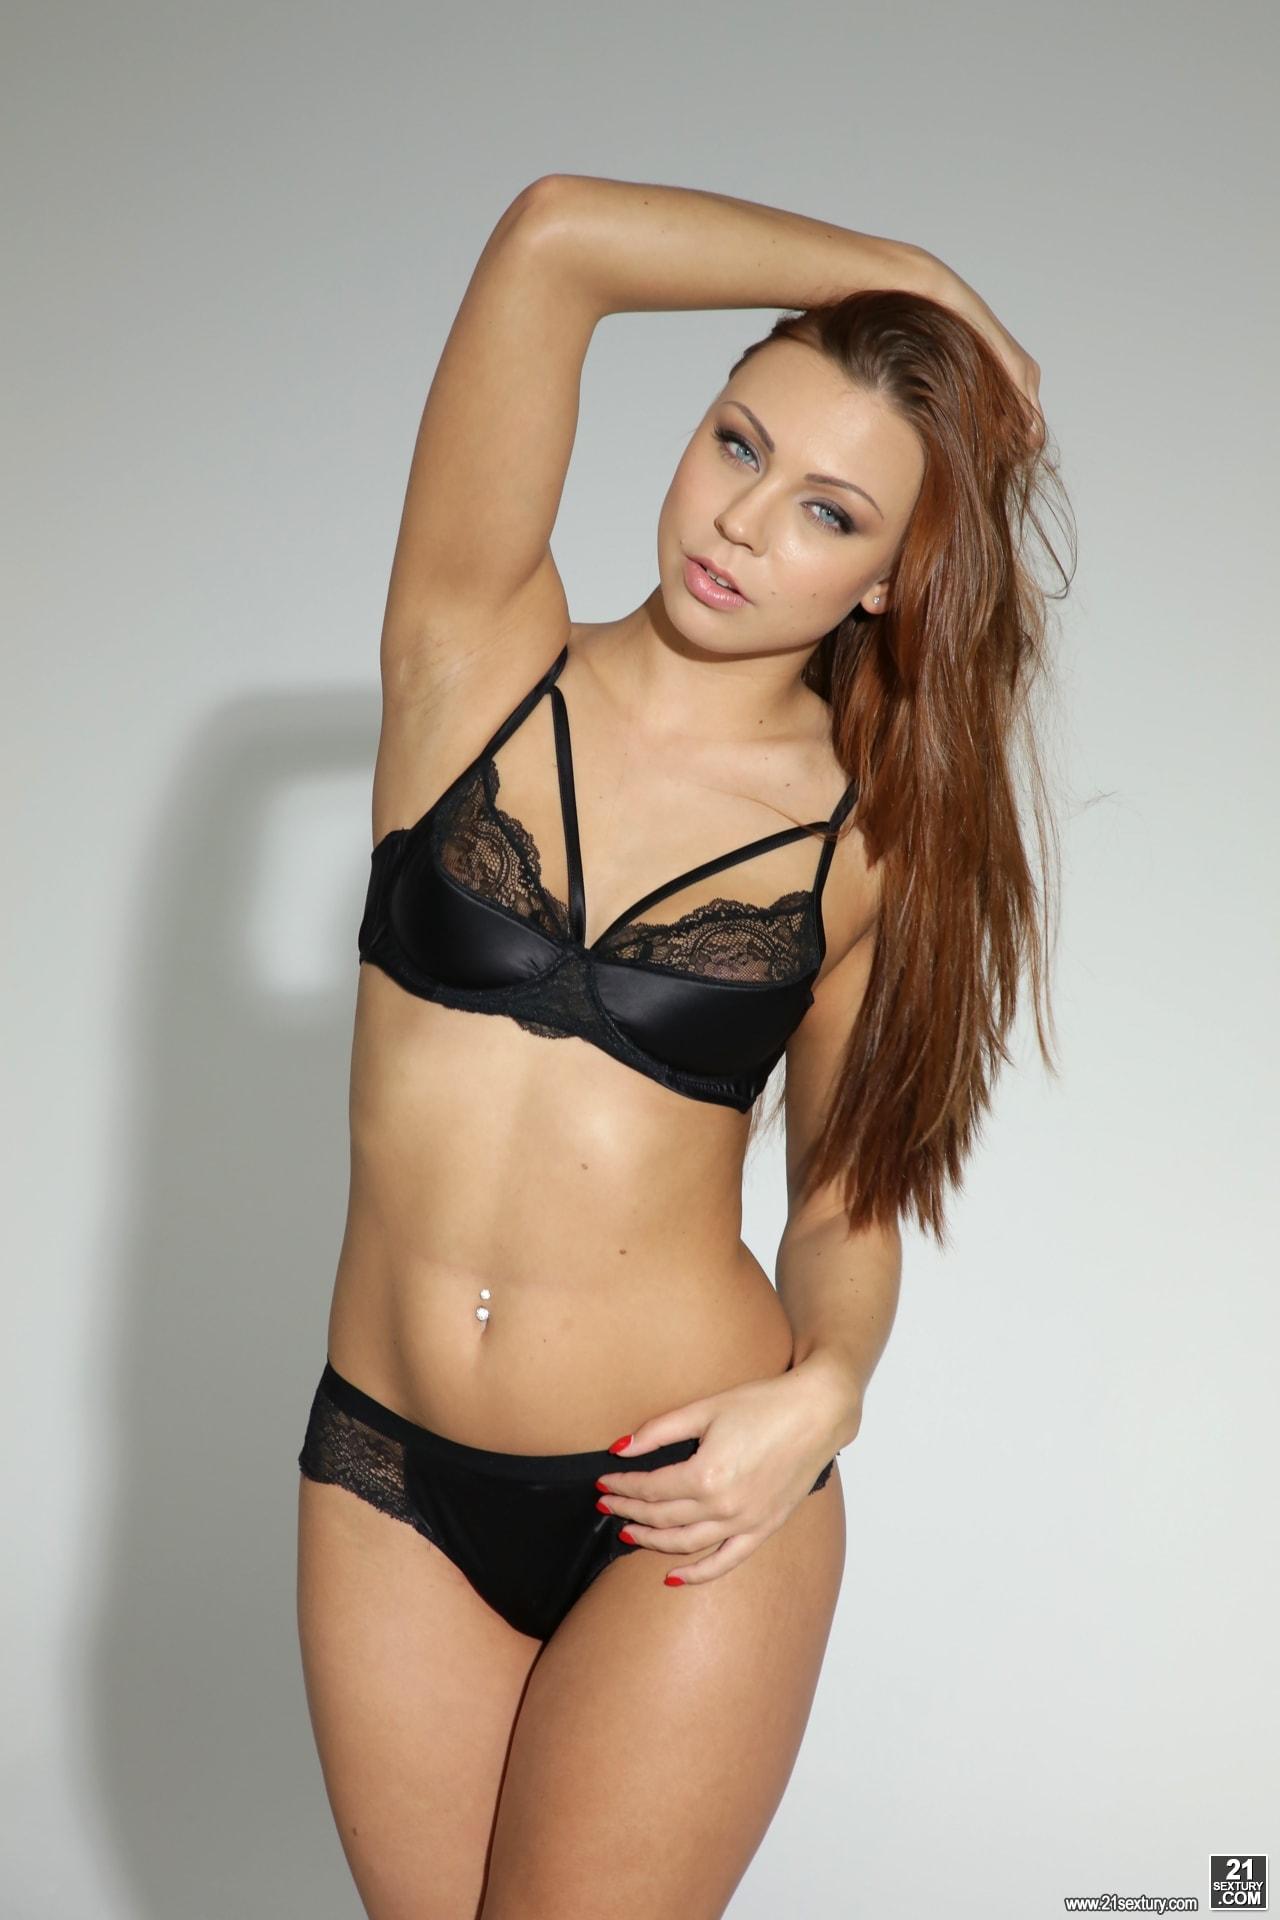 21Sextury 'Foot Model' starring Ornella Morgan (Photo 1)